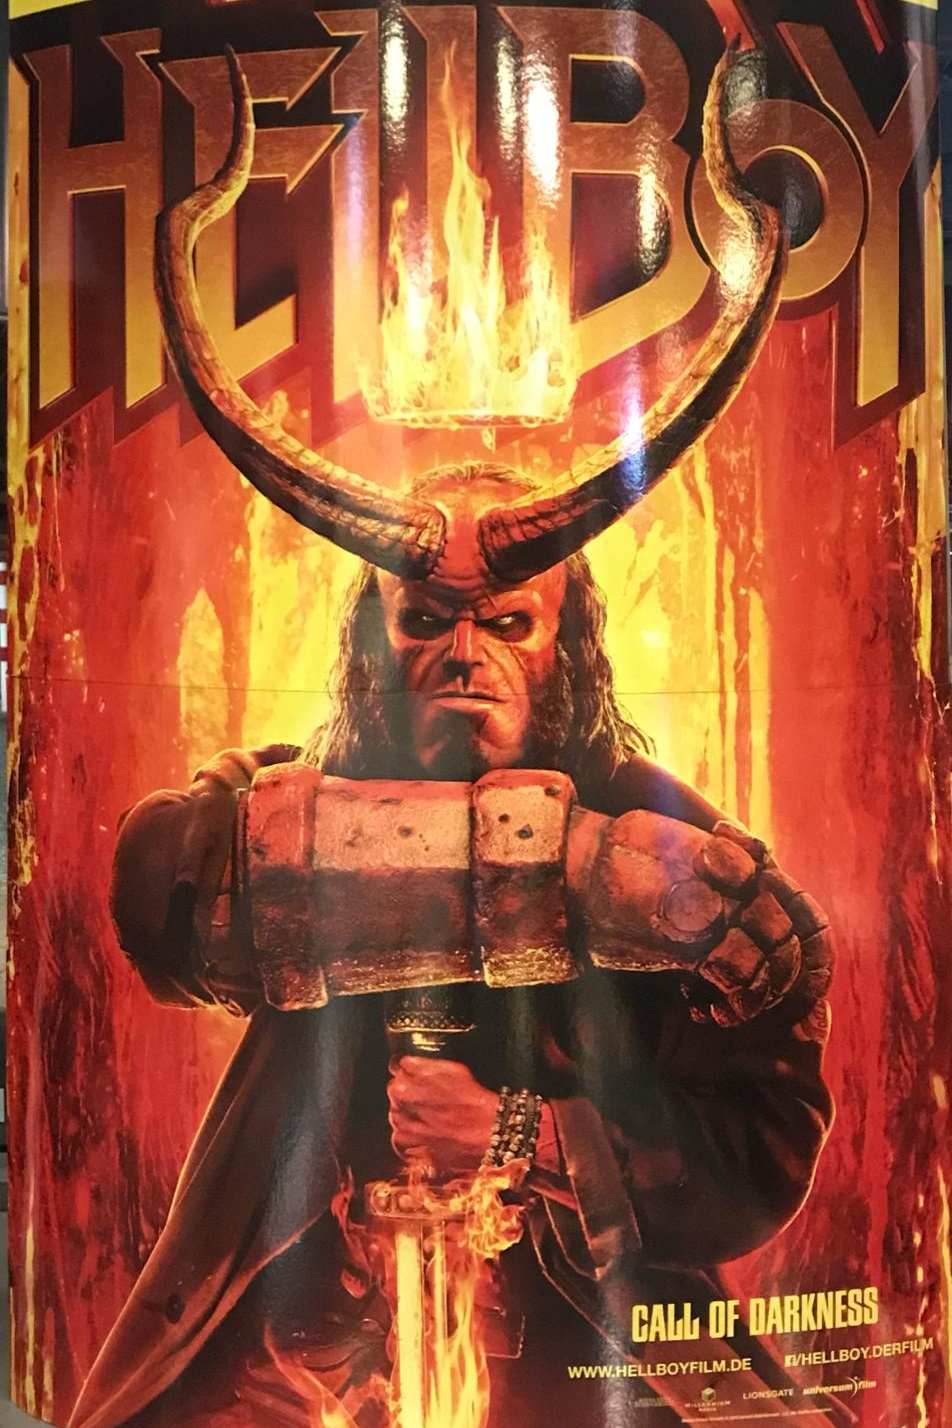 Hellboy Hörner